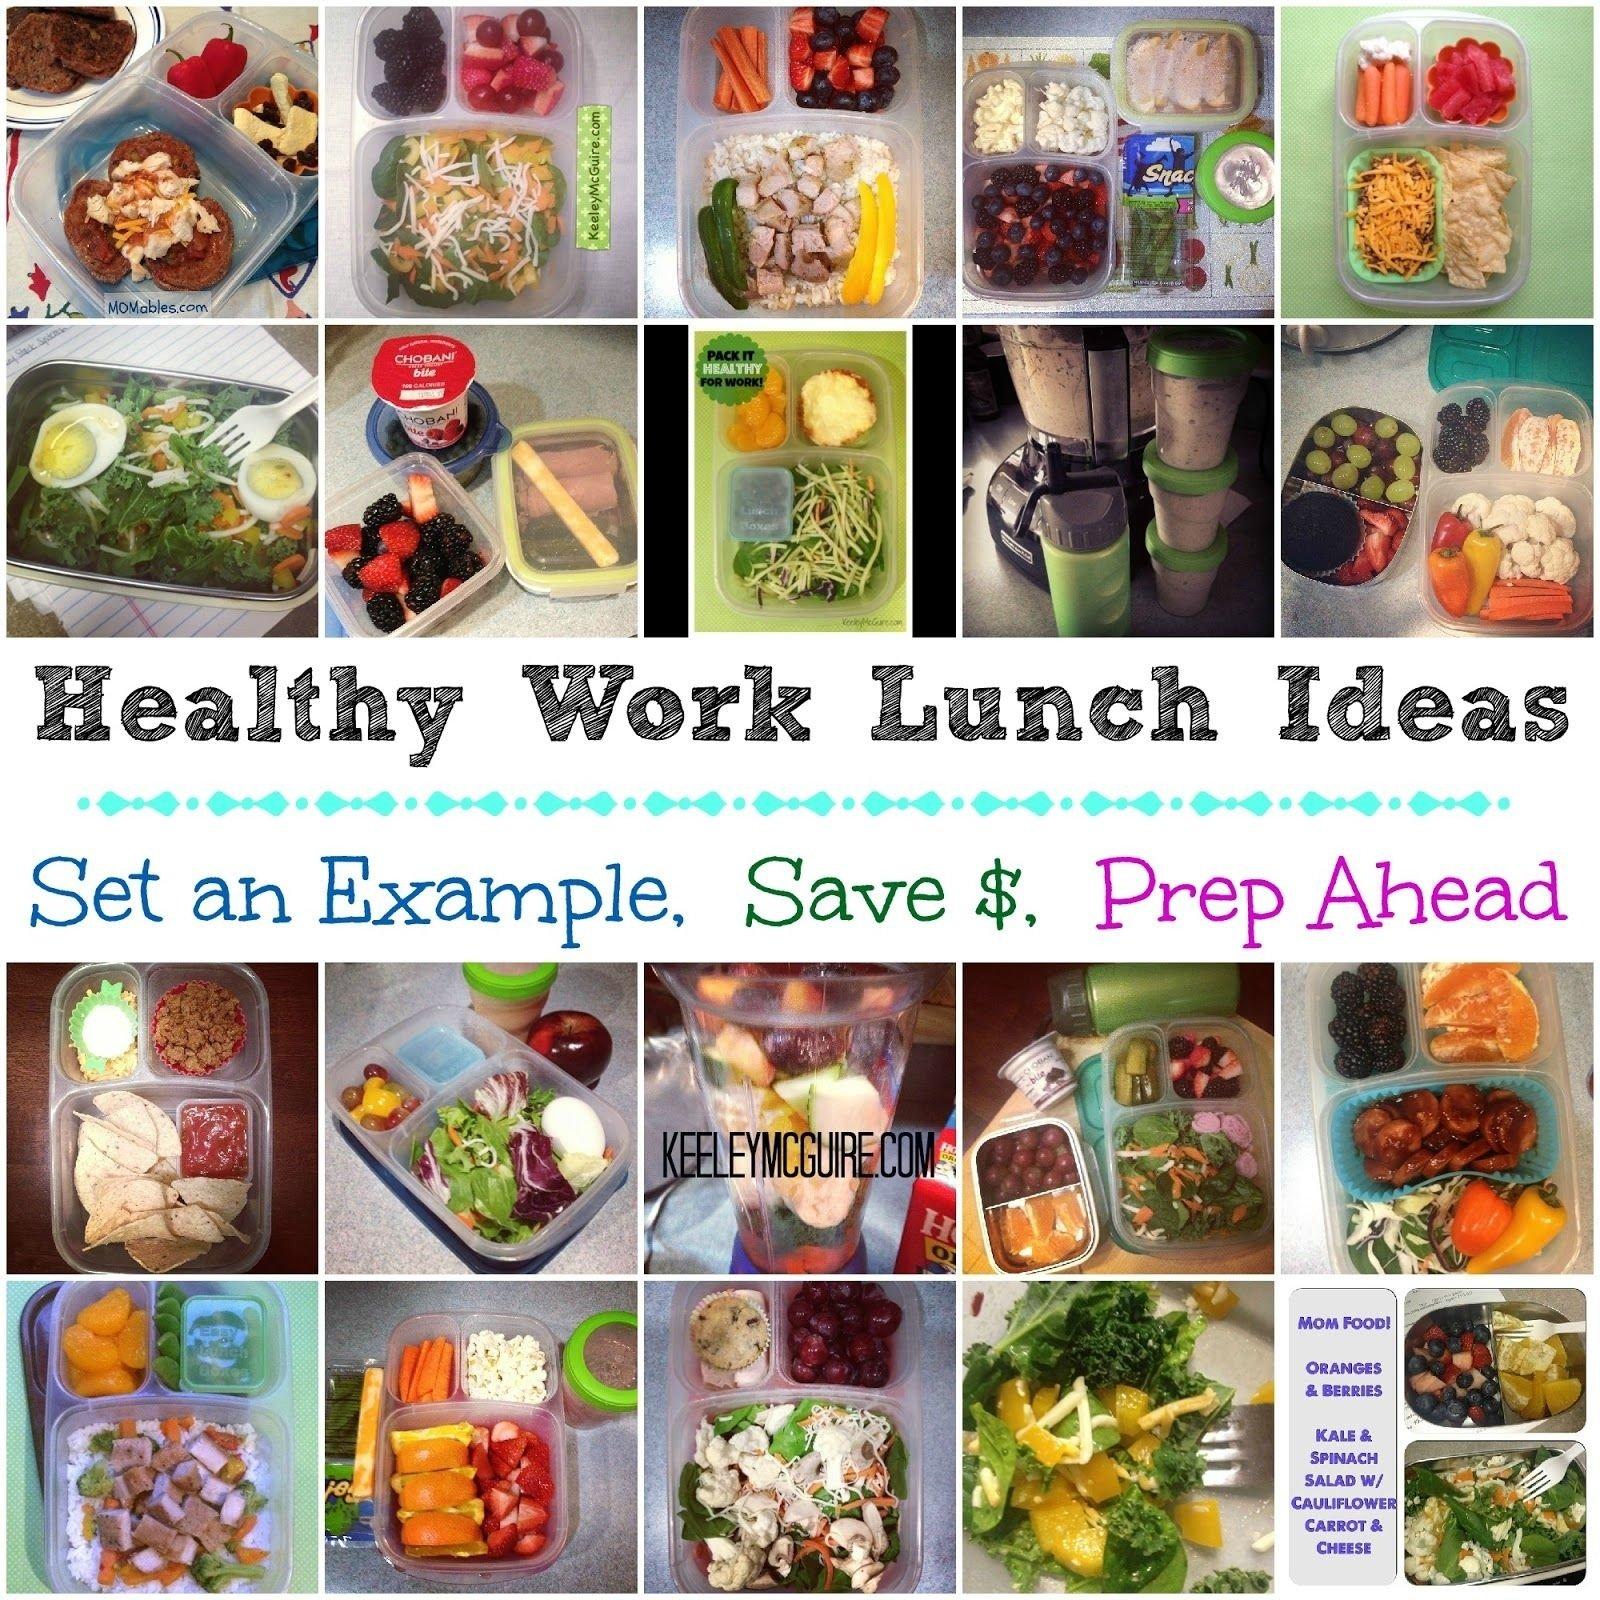 10 Elegant Easy Healthy Lunch Ideas For Work keeley mcguire lunch made easy healthy work lunches for mom or 1 2020